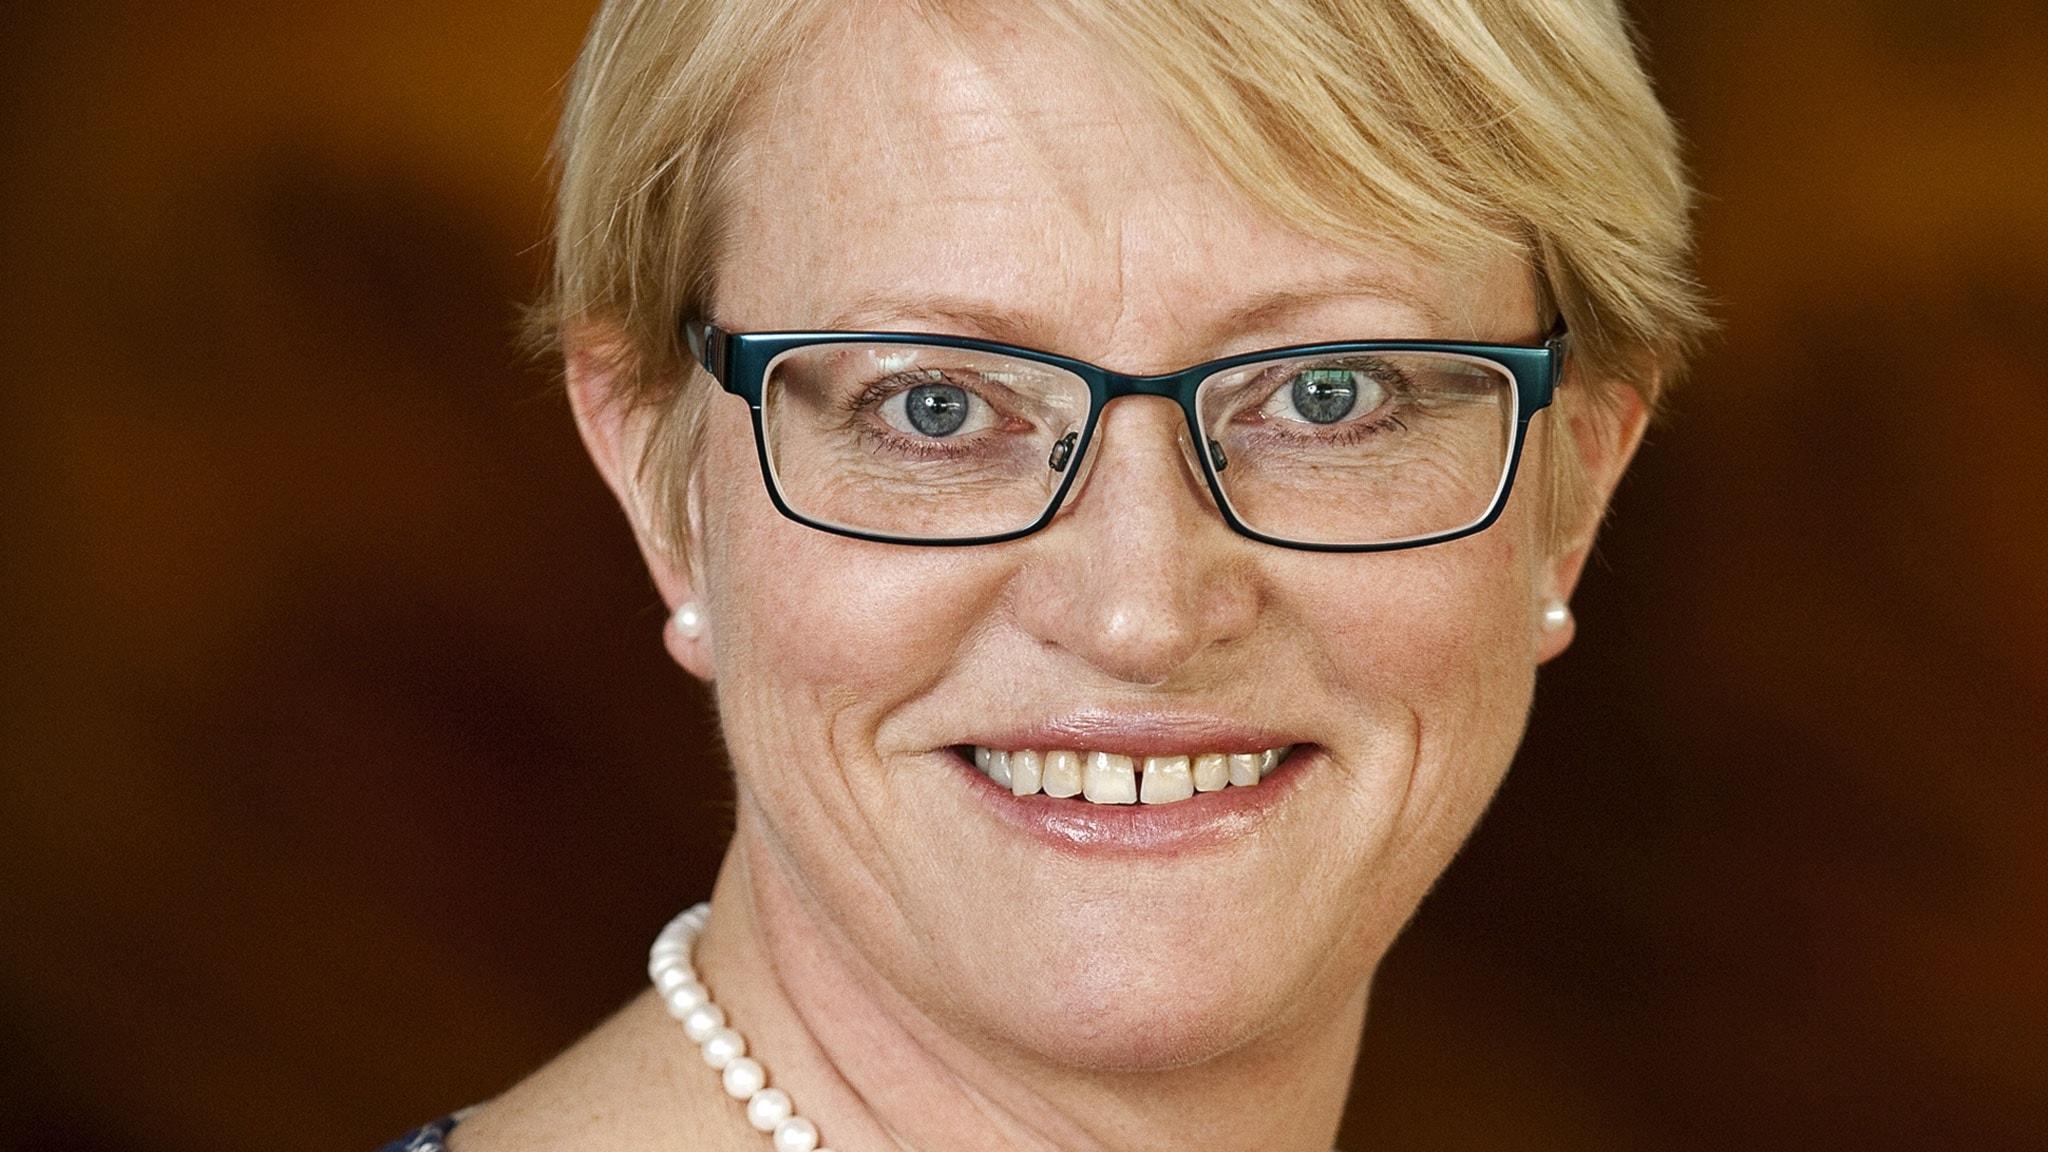 Ing-Marie Wieselgren -